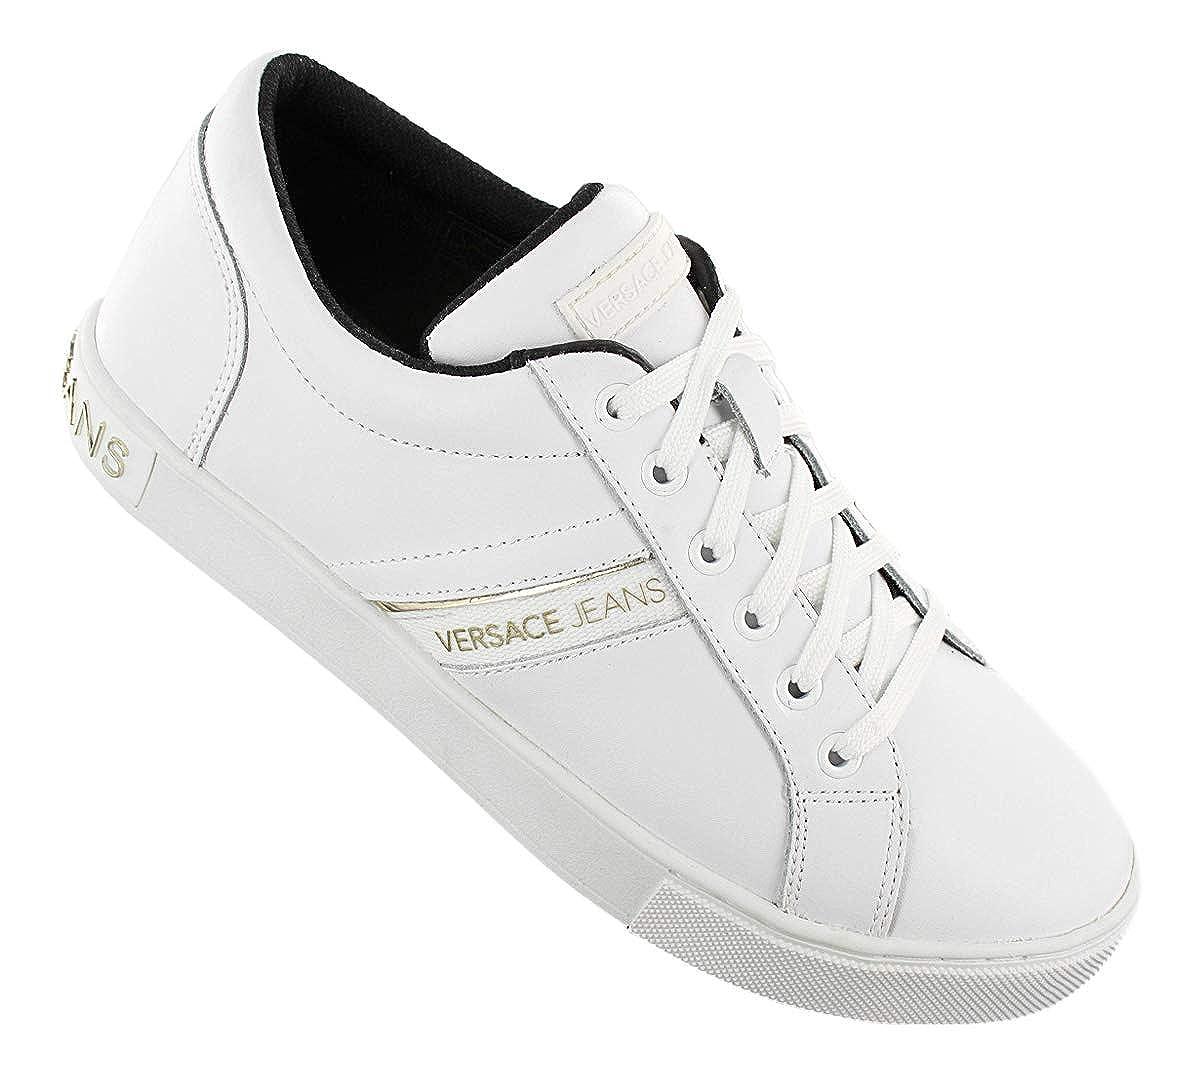 New E0vsbsf170815899Scarpe Kim Linea Fondo 1 Jeans Dis Versace BxeCrdo